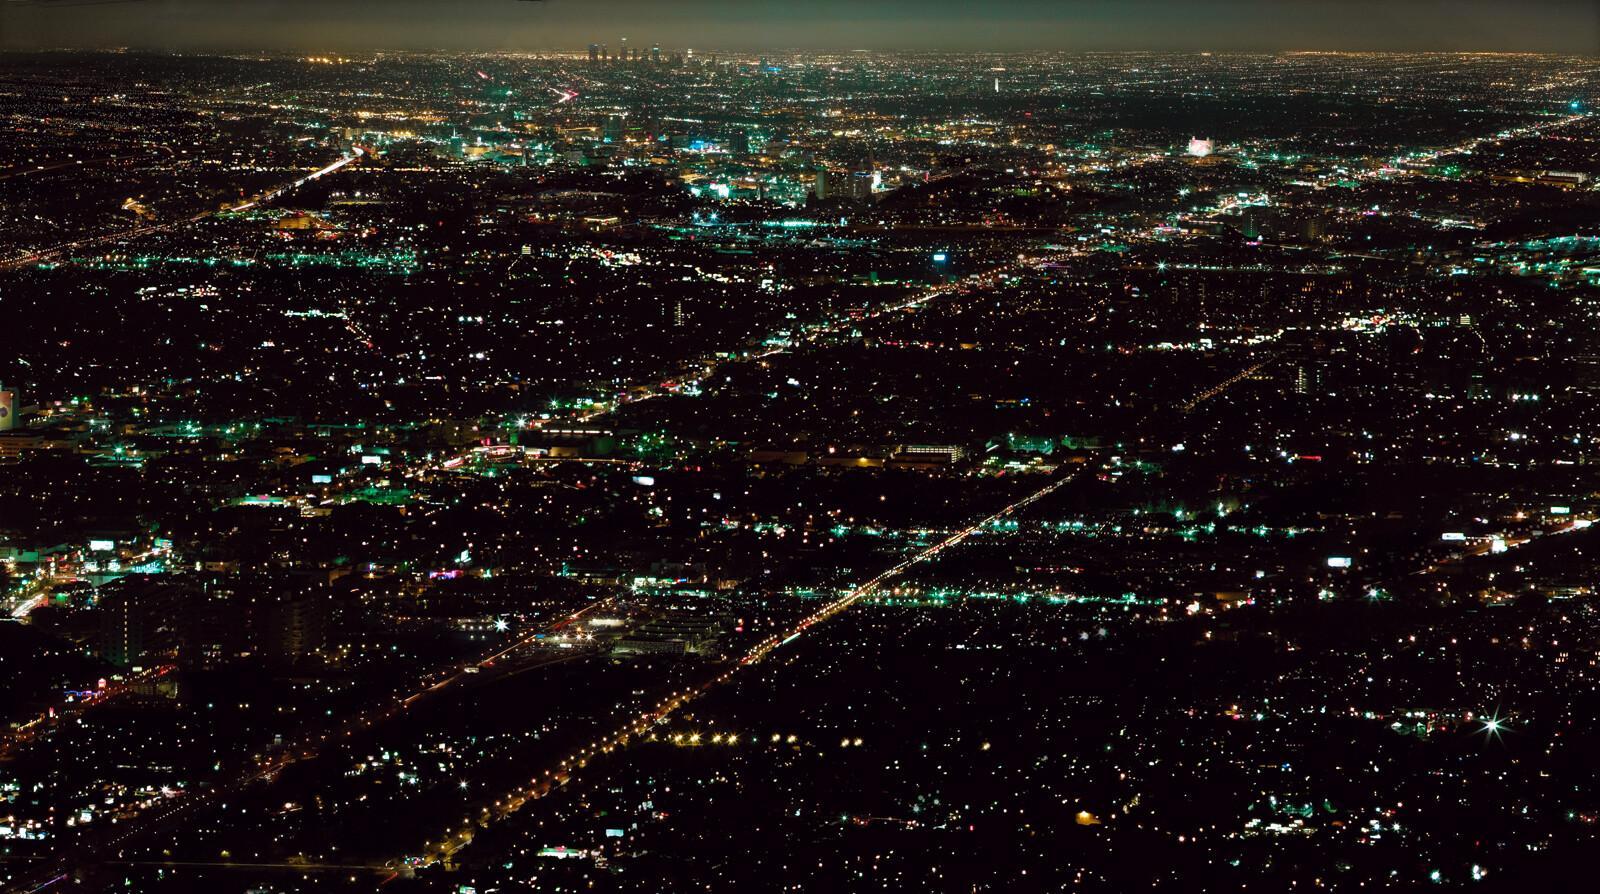 L.A.1 - Christian Stoll